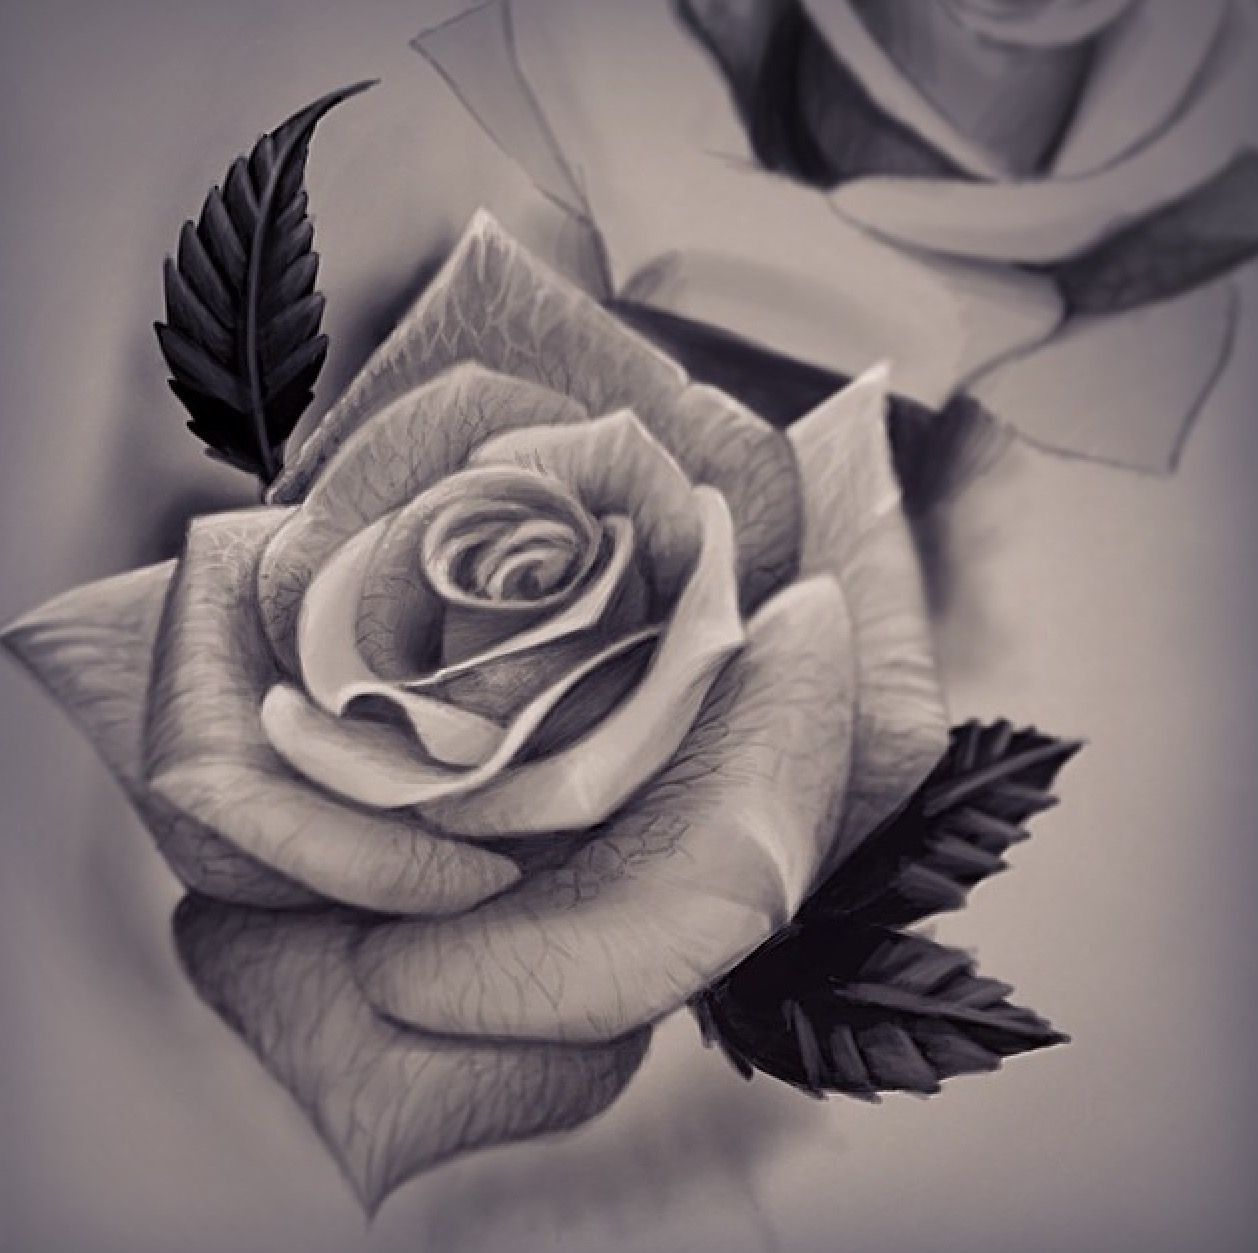 Pin by Bleu Beauty on David Garcia | Tatoeage ideeën ...